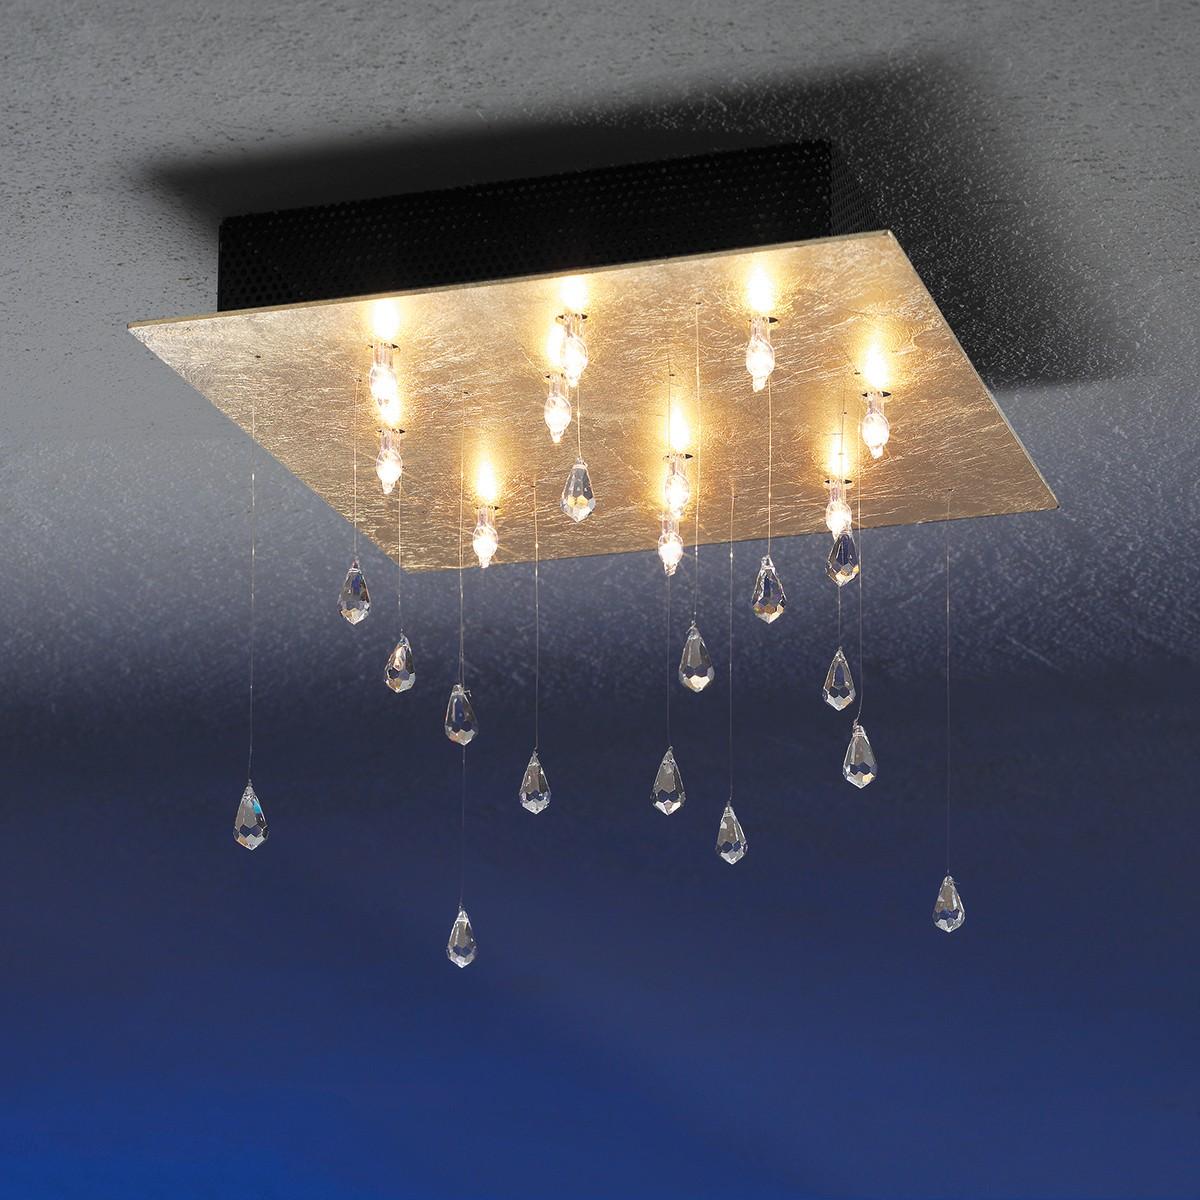 Escale Crystal Rain Deckenleuchte, Blattgold, 40 x 40 cm